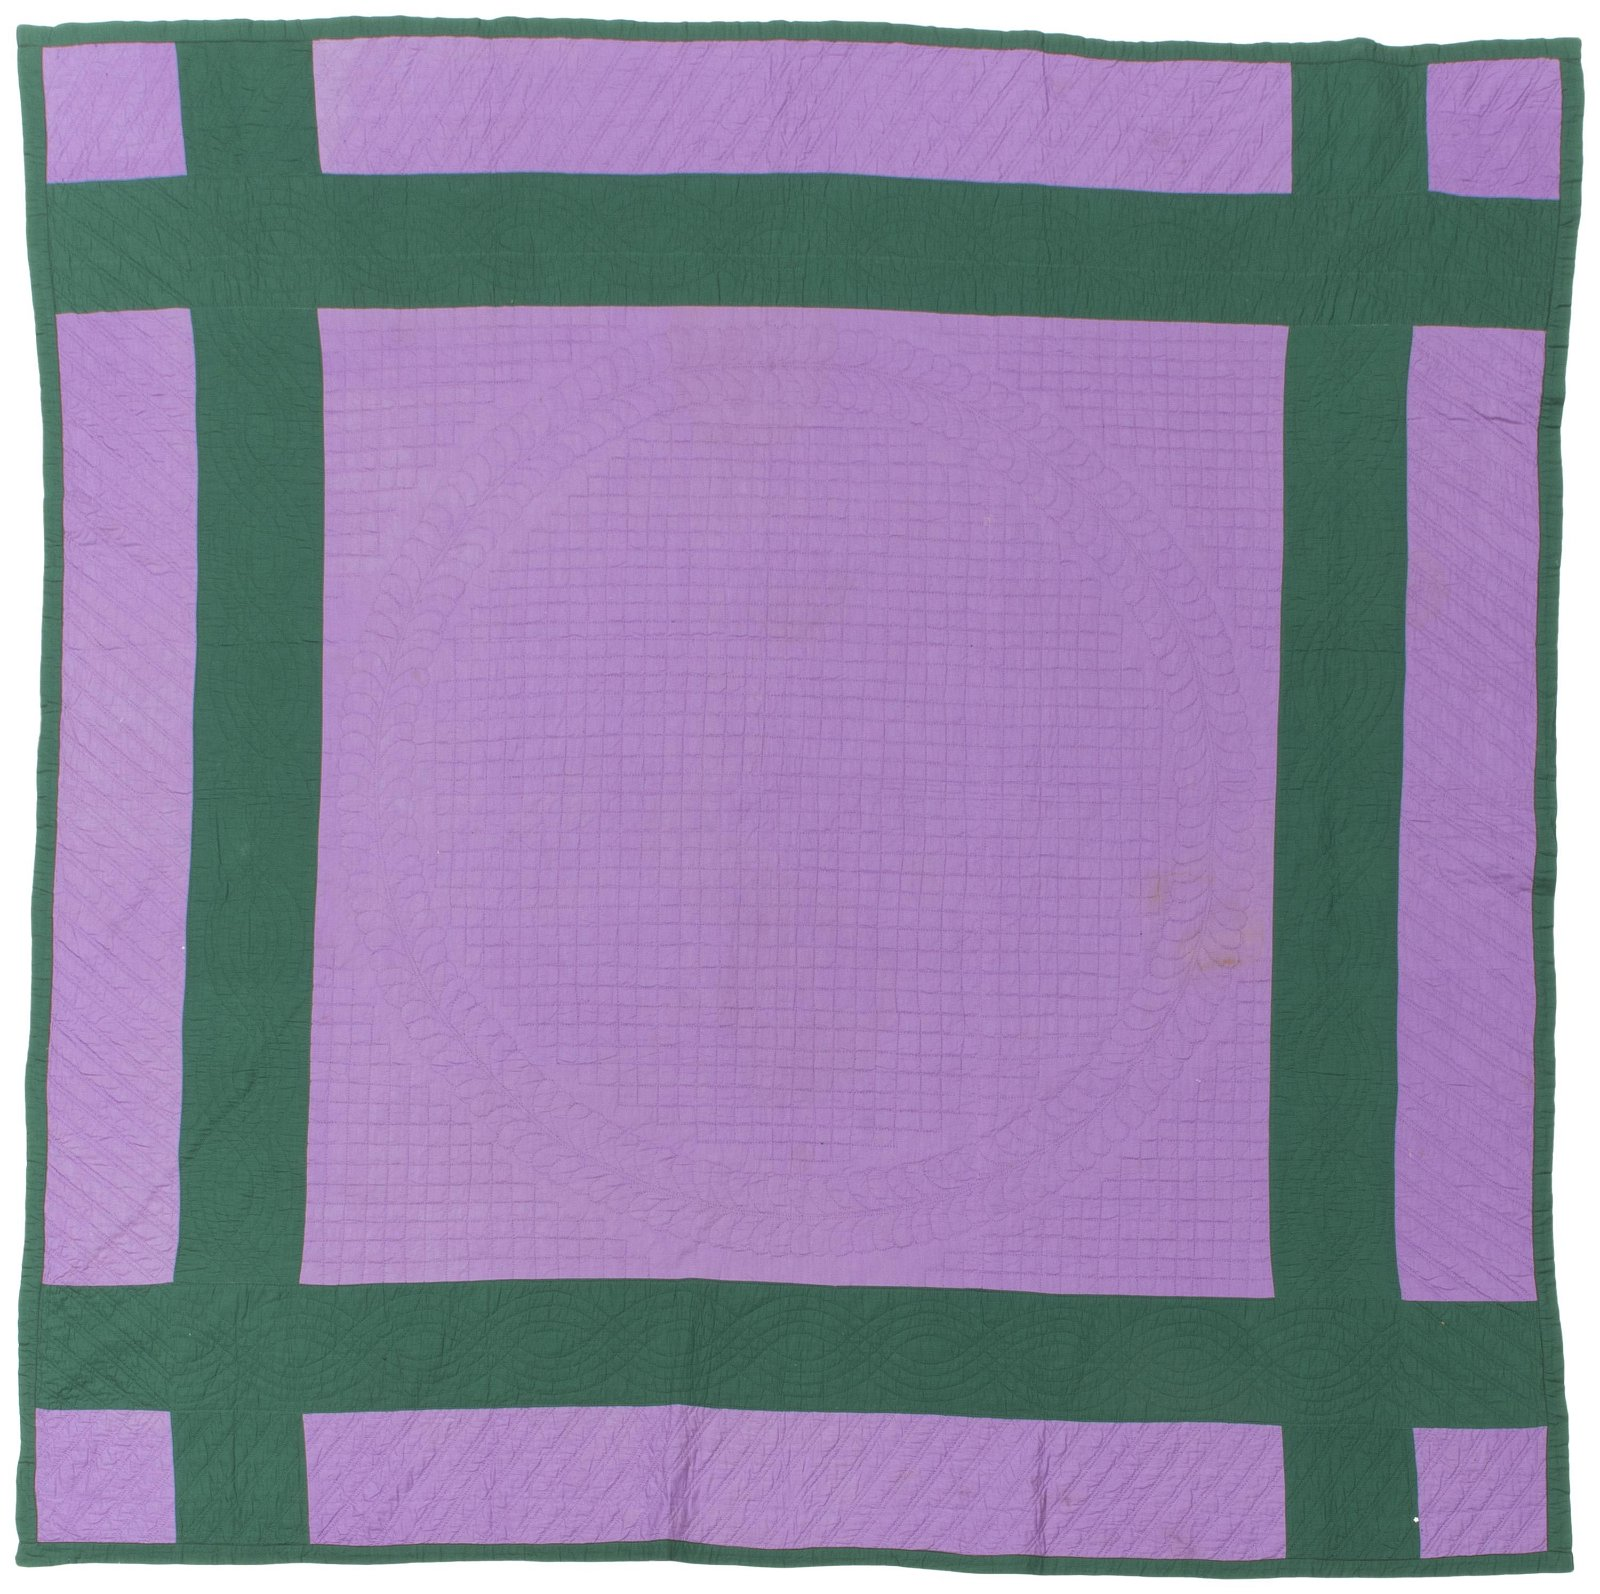 An Amish Window Pane/Plain quilt